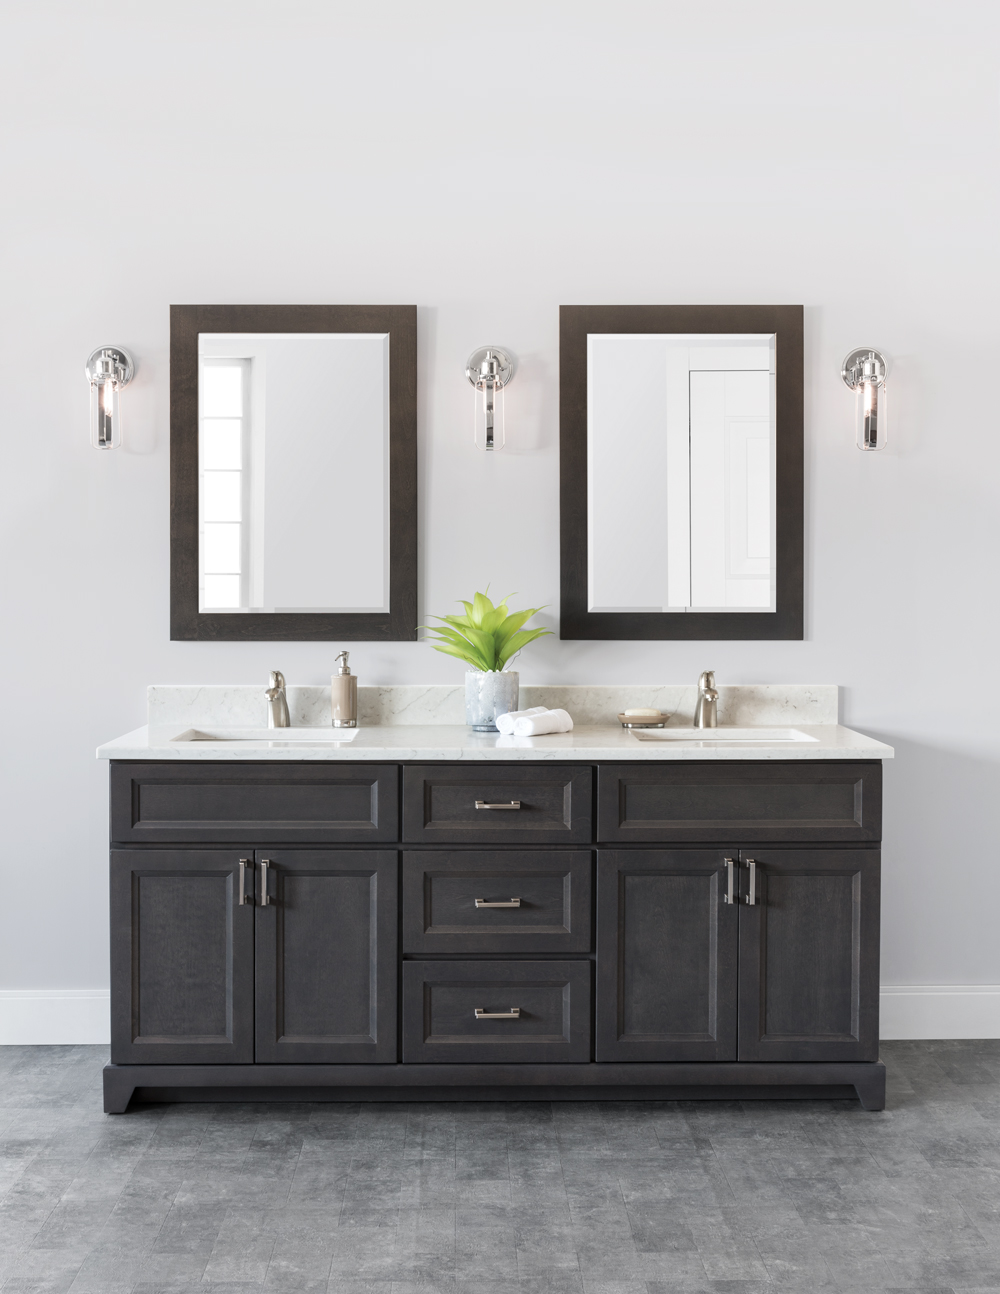 Stonewood Bathroom Cabinets Hamilton